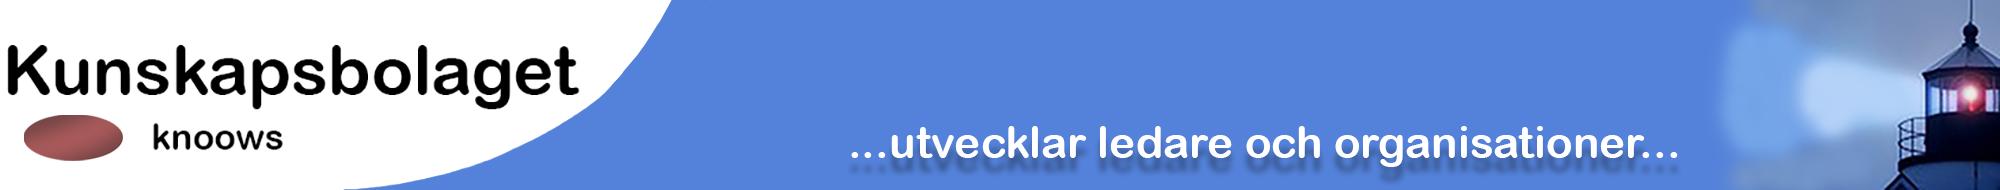 kunskapsbolagets logga